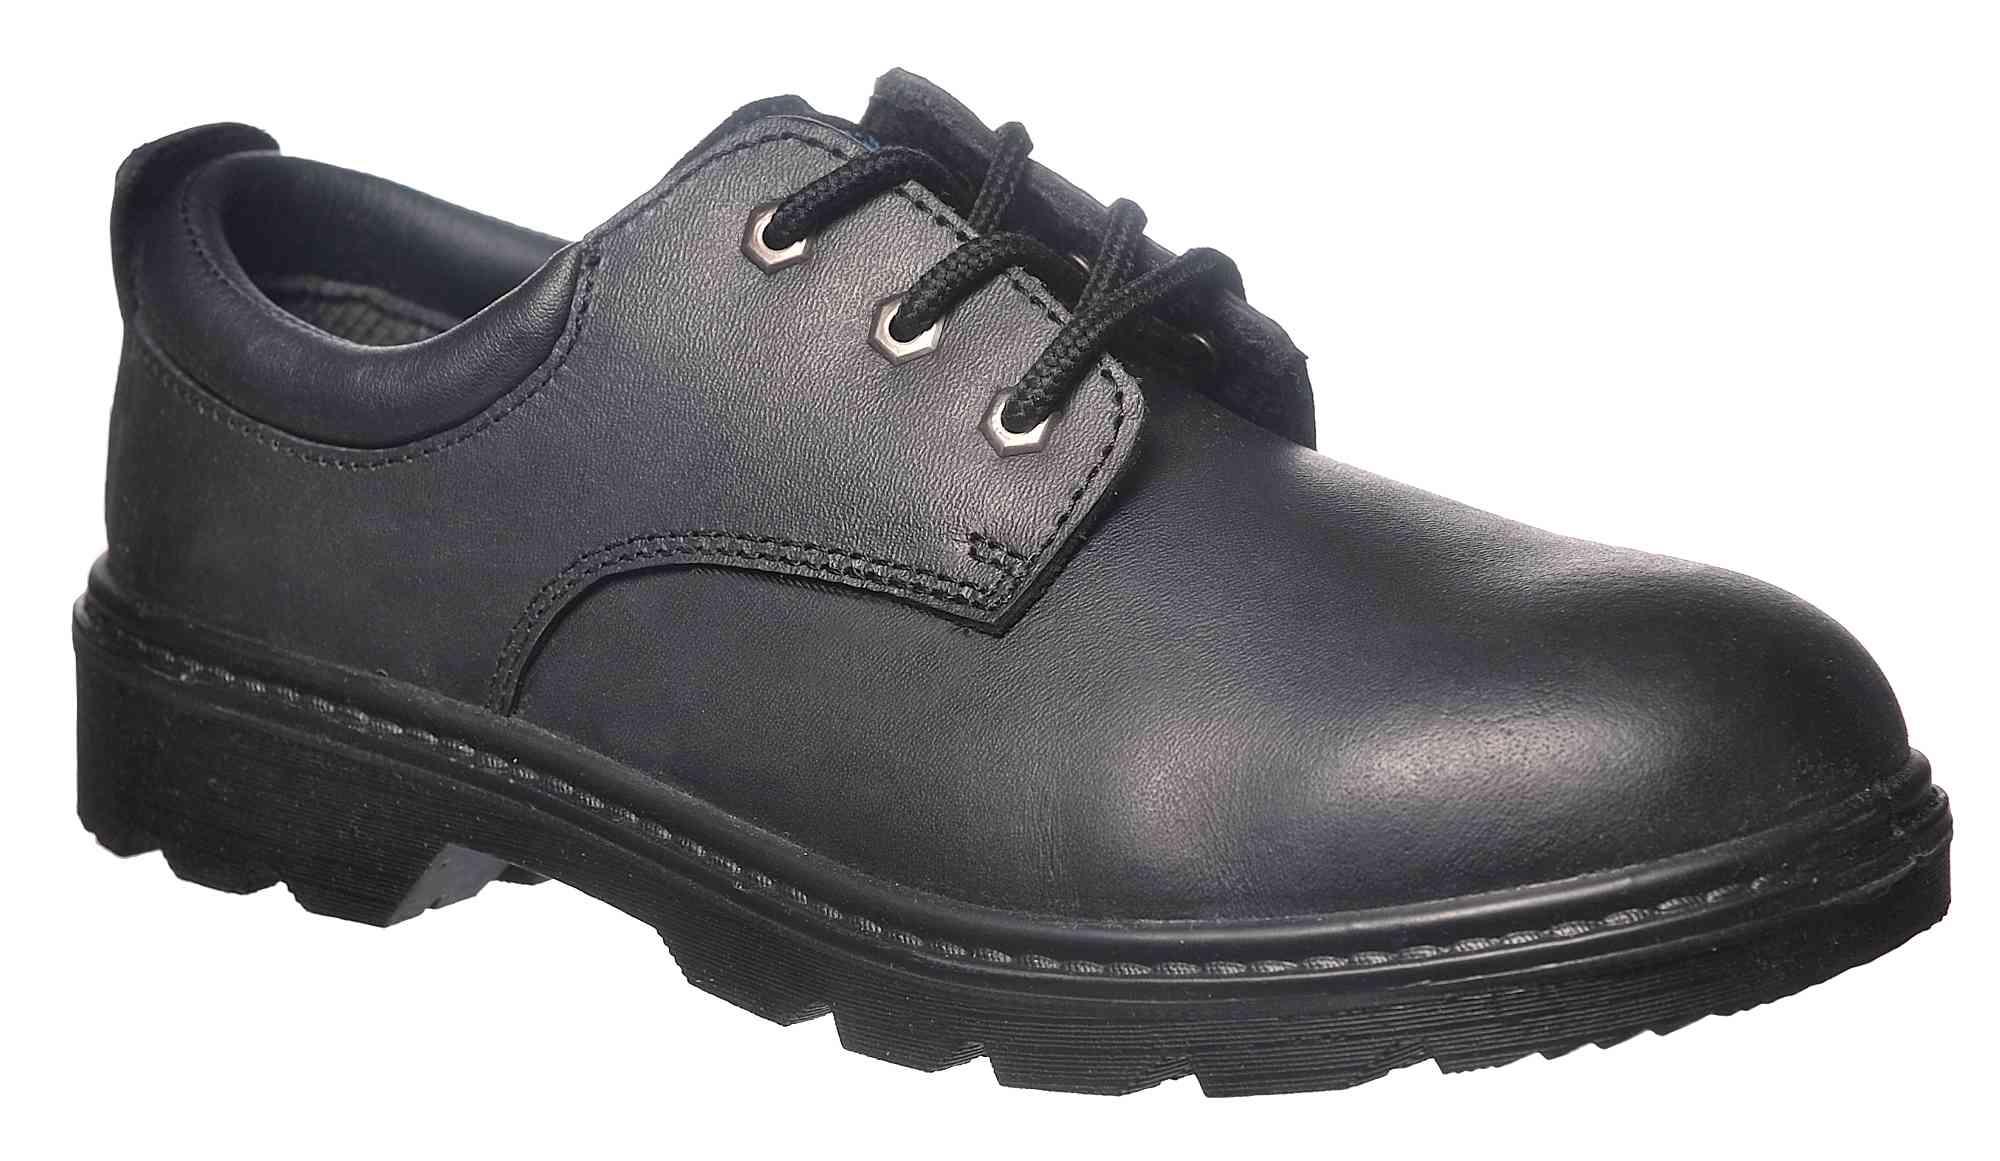 43b588305e0 Portwest FW44 Steelite Thor Steel Toe Cap S3 SRA Mens Safety Shoes